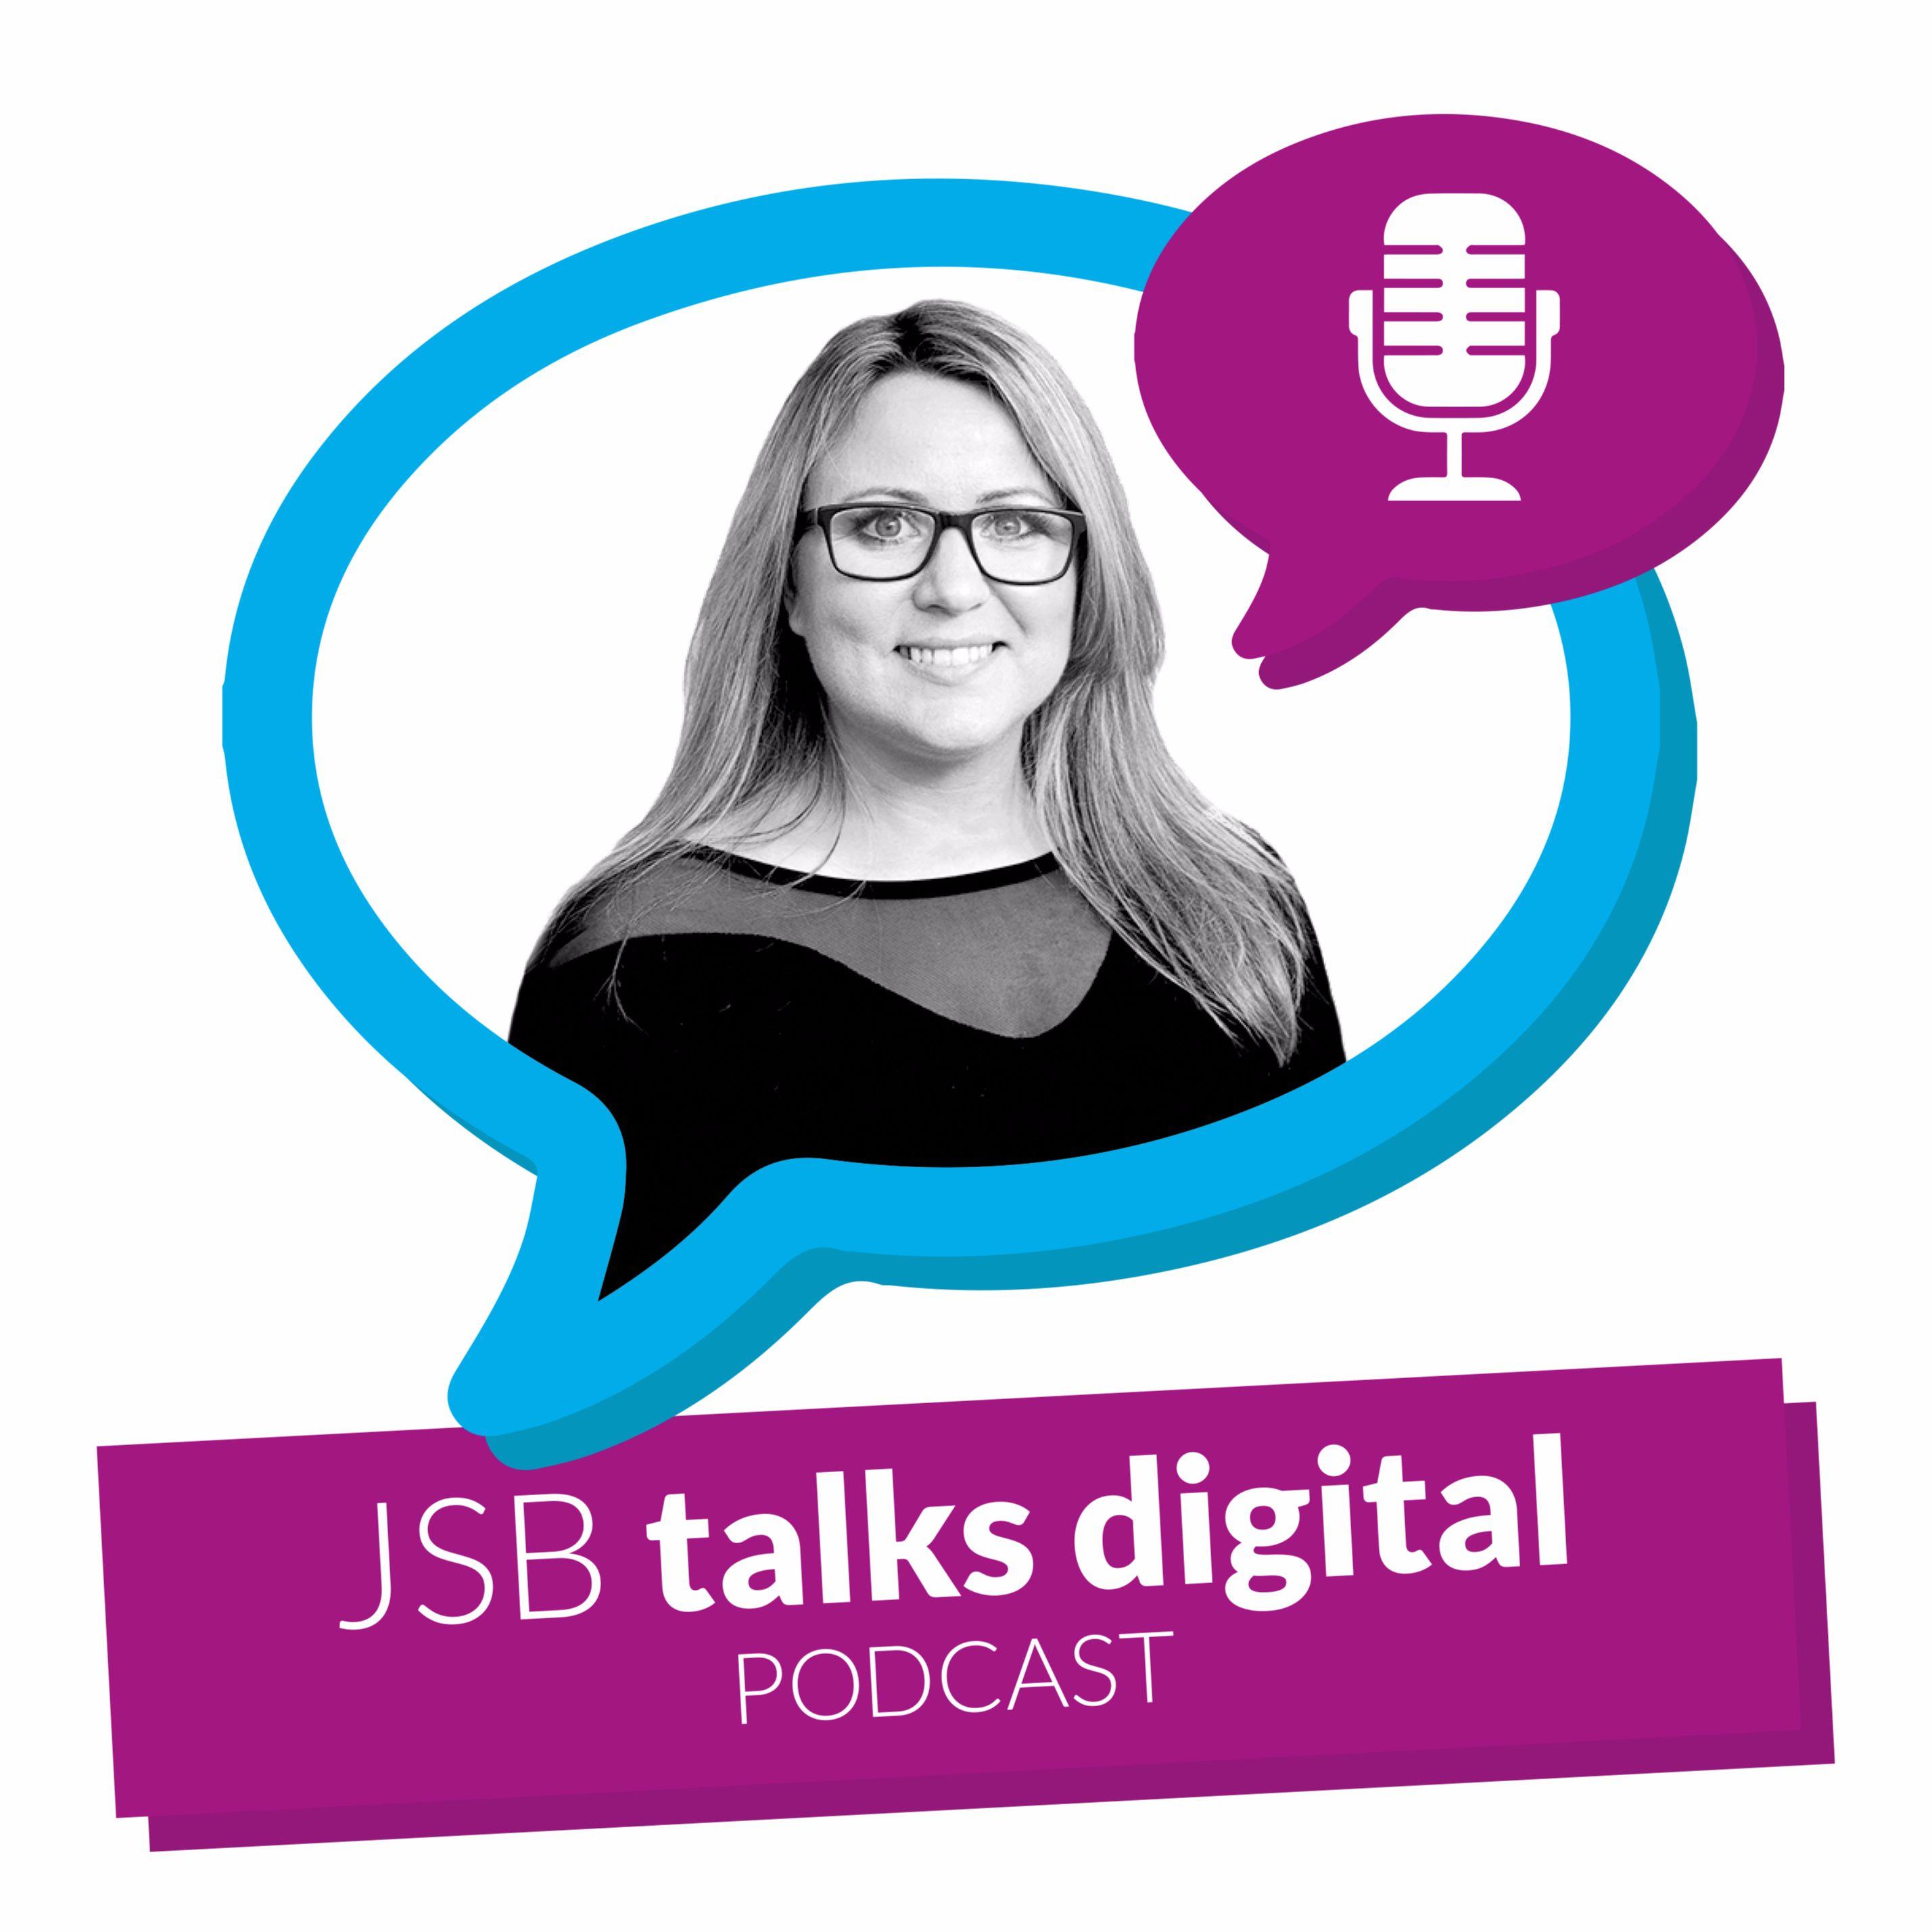 JS Talks Digital – Public Sector Marketing Podcast show art